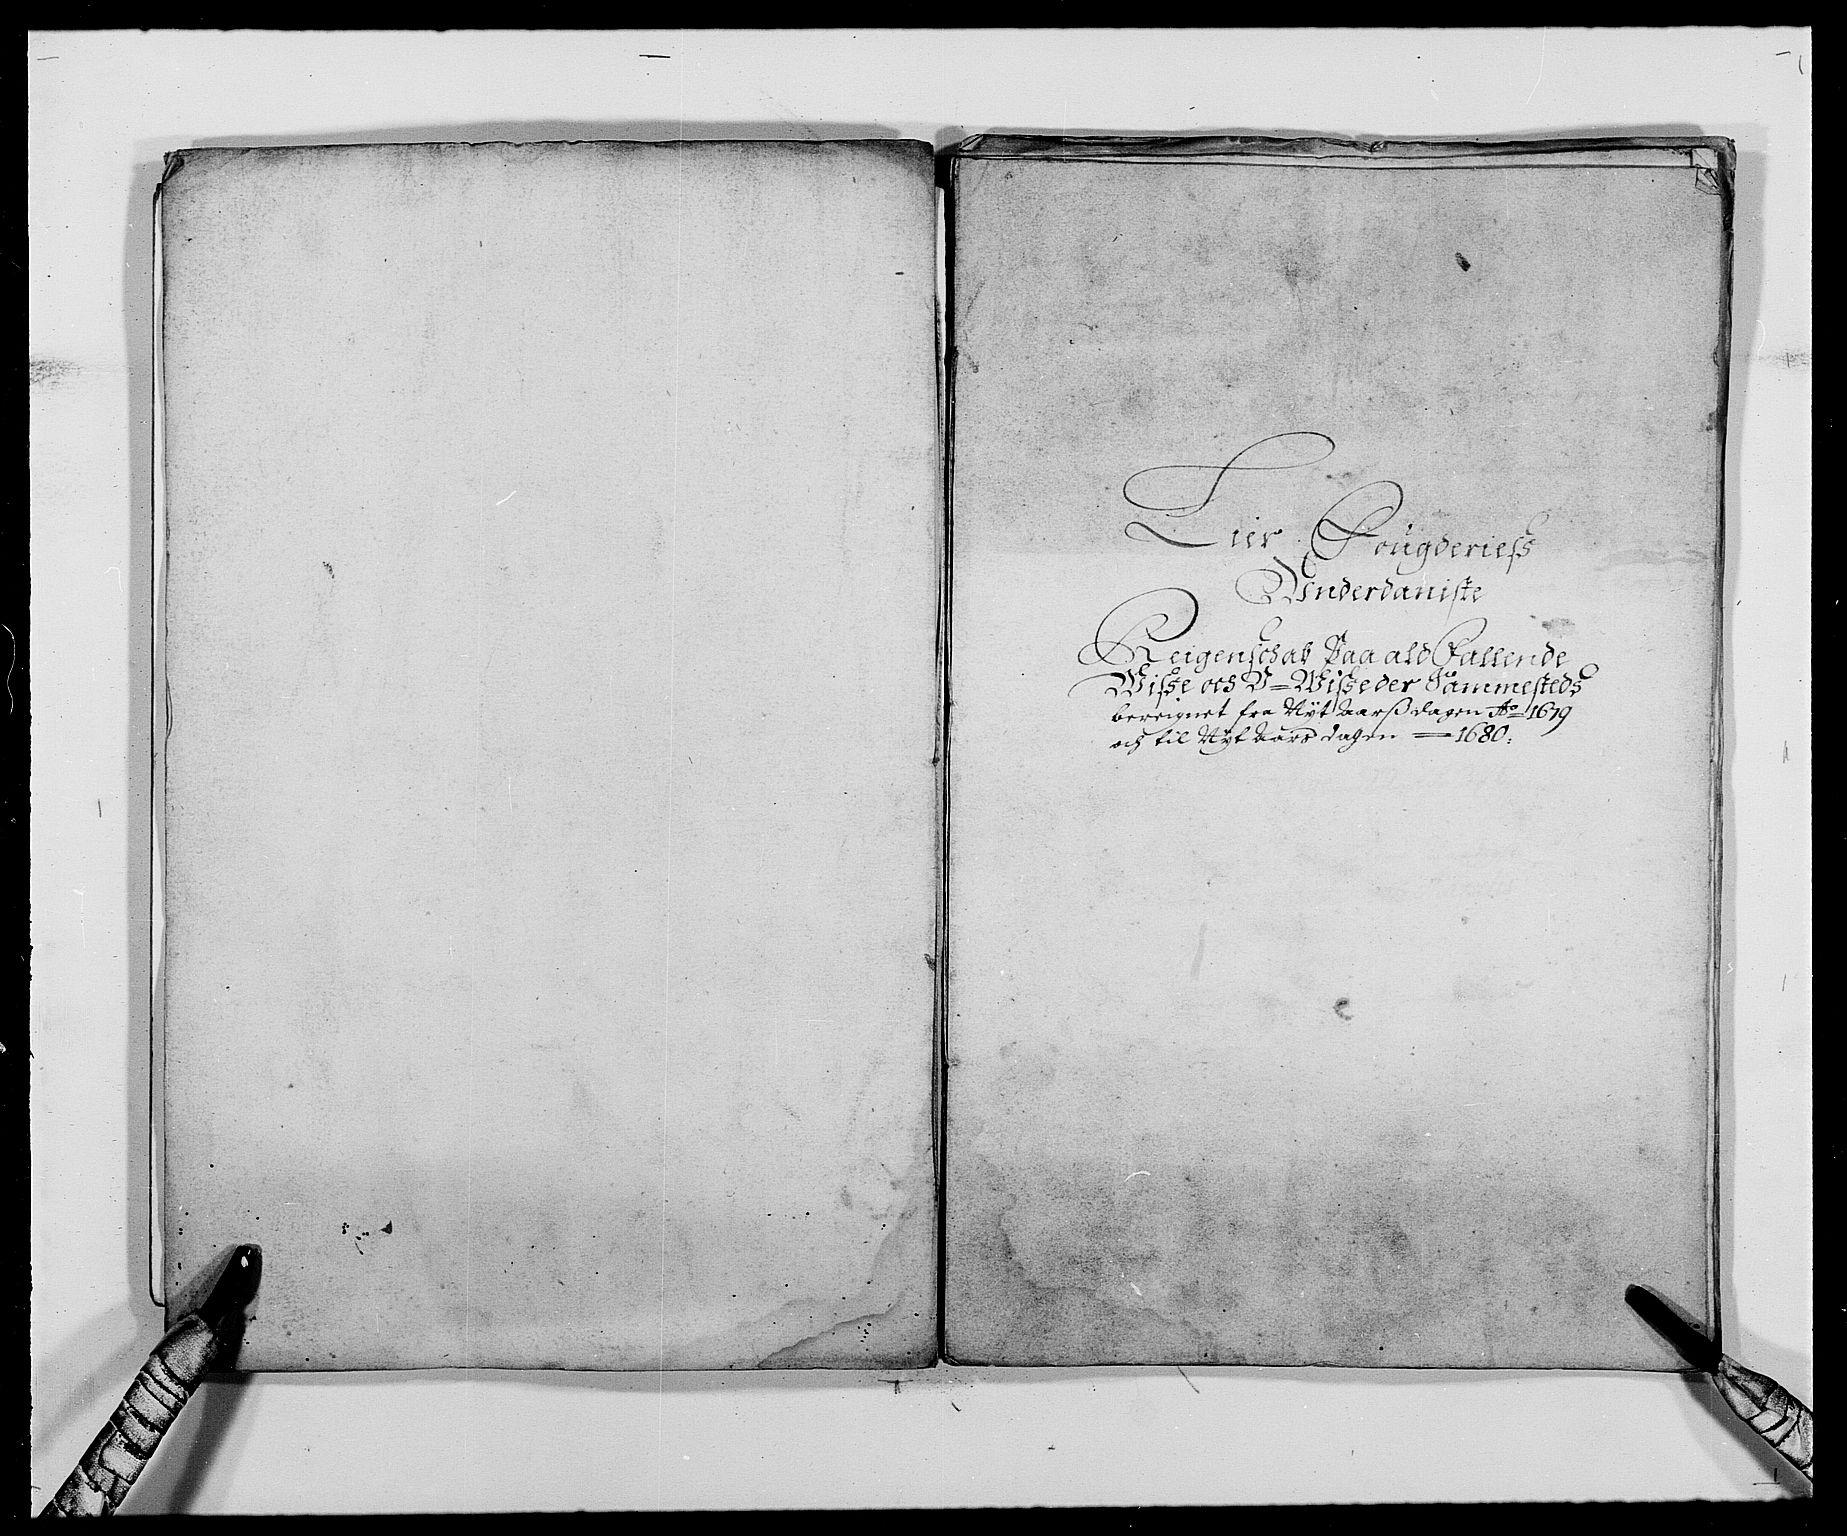 RA, Rentekammeret inntil 1814, Reviderte regnskaper, Fogderegnskap, R27/L1687: Fogderegnskap Lier, 1678-1686, s. 306